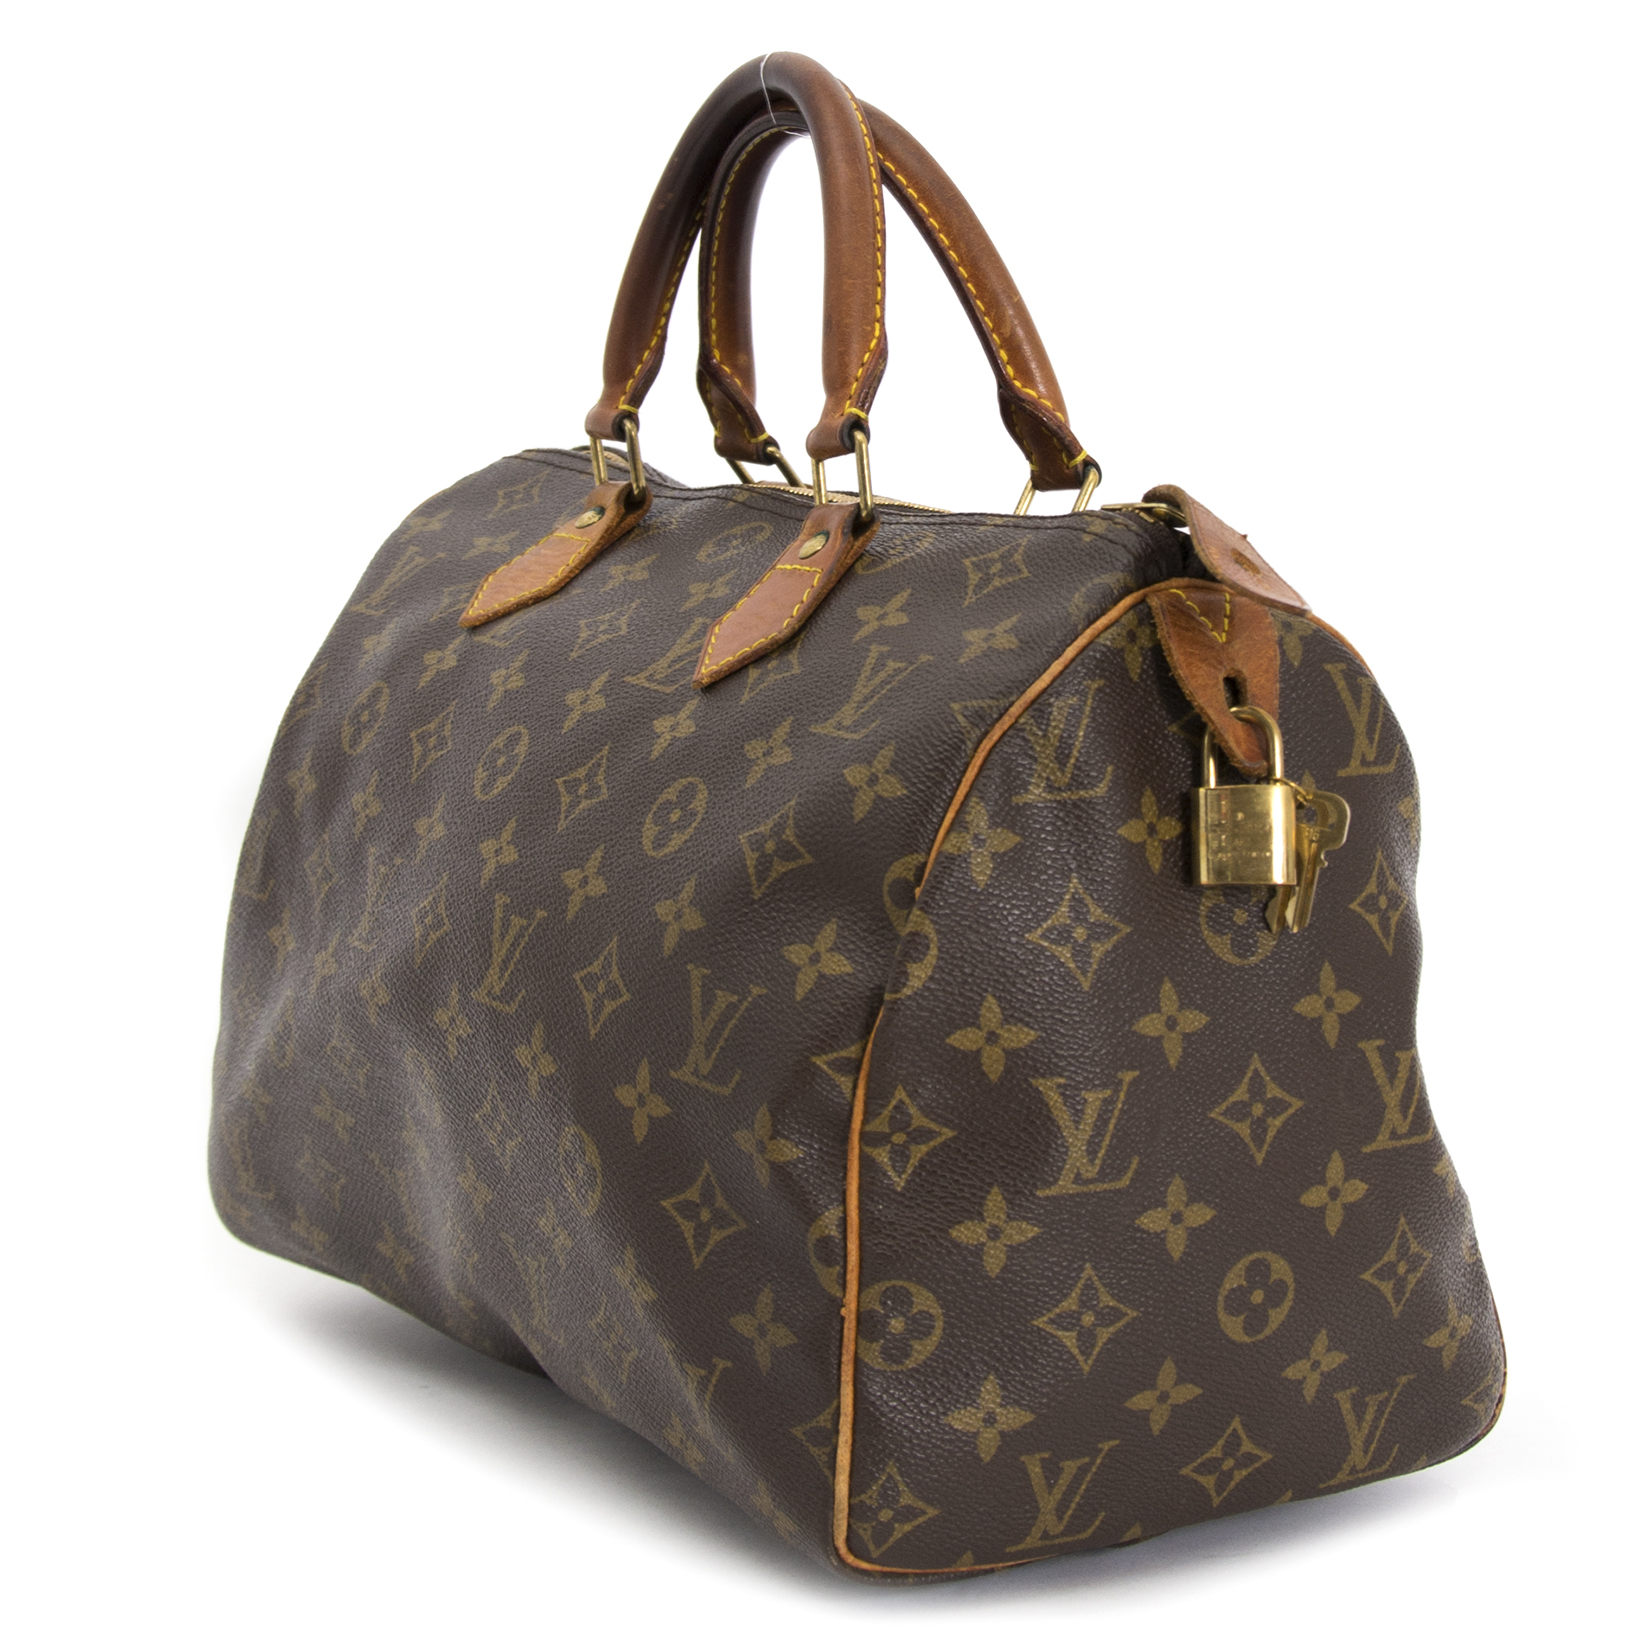 acheter en ligne seconde main  Louis Vuitton Monogram Speedy 30